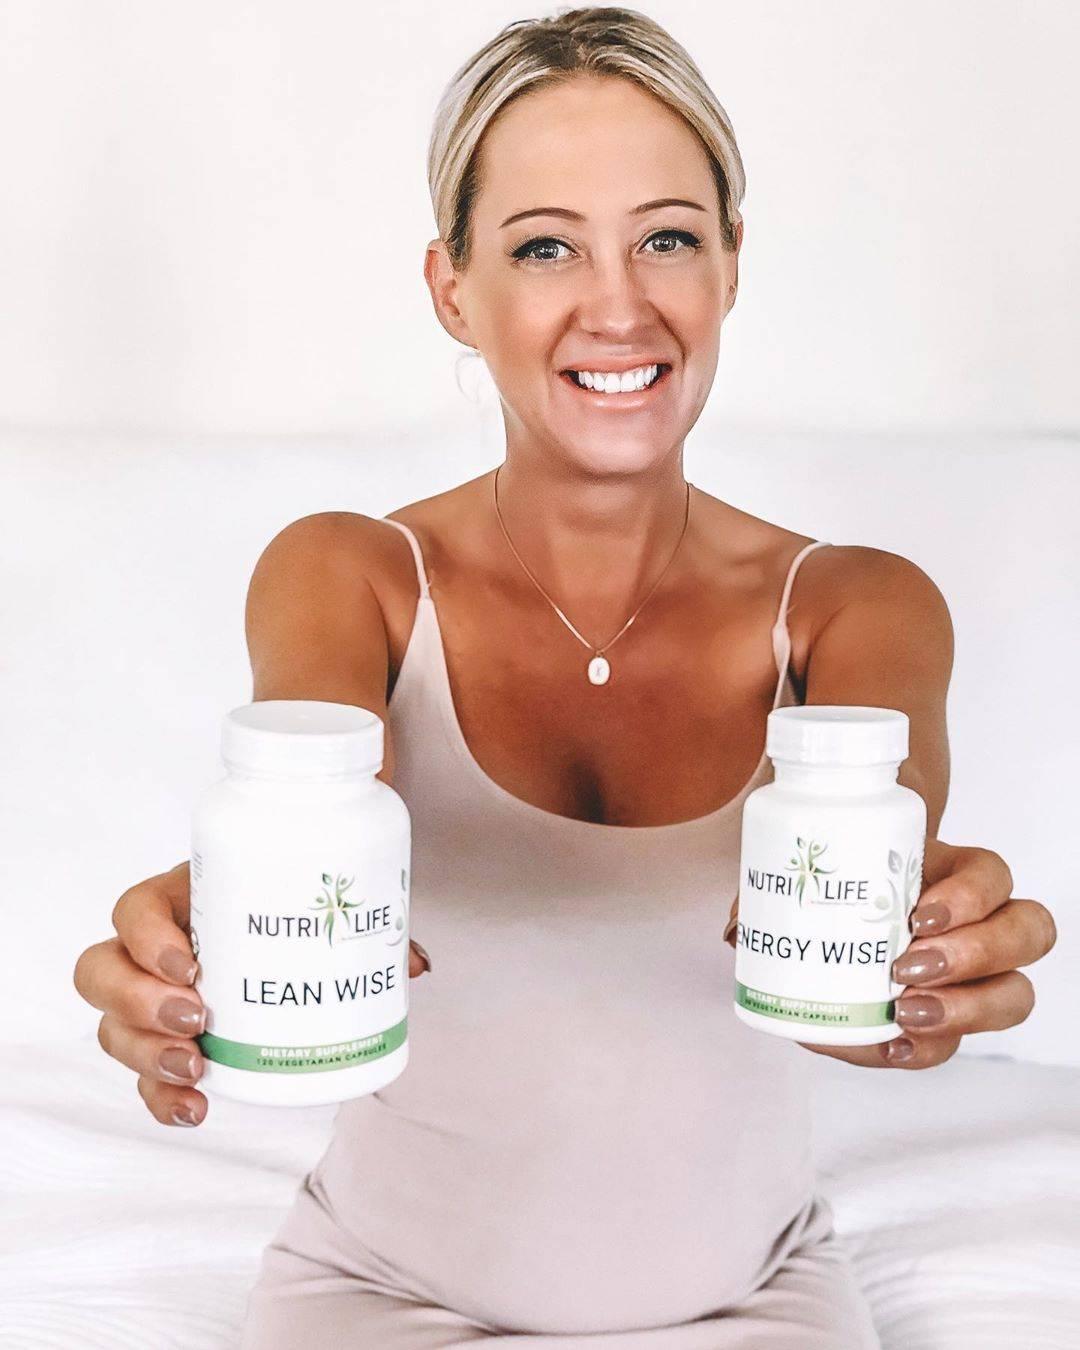 Woman holding a bottle of NutriLife LeanWise Dietary Supplement, and a bottle of NutriLife EnergyWIse Dietary Supplement